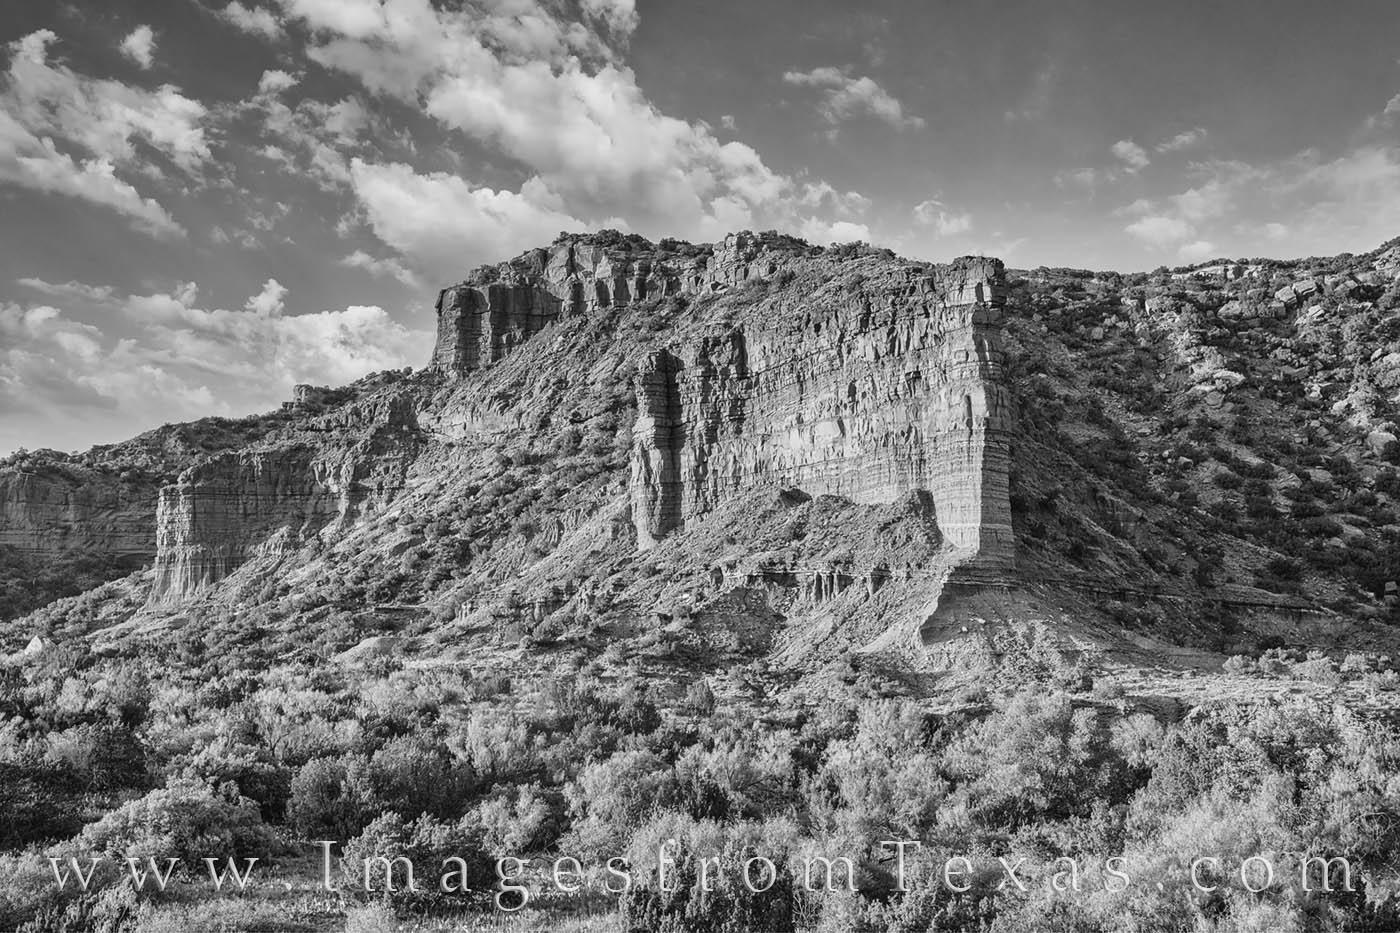 south prong overlook, caprock canyons, llano estacado, hiking texas, west texas, texas prints, solitude, black and white prints, photo